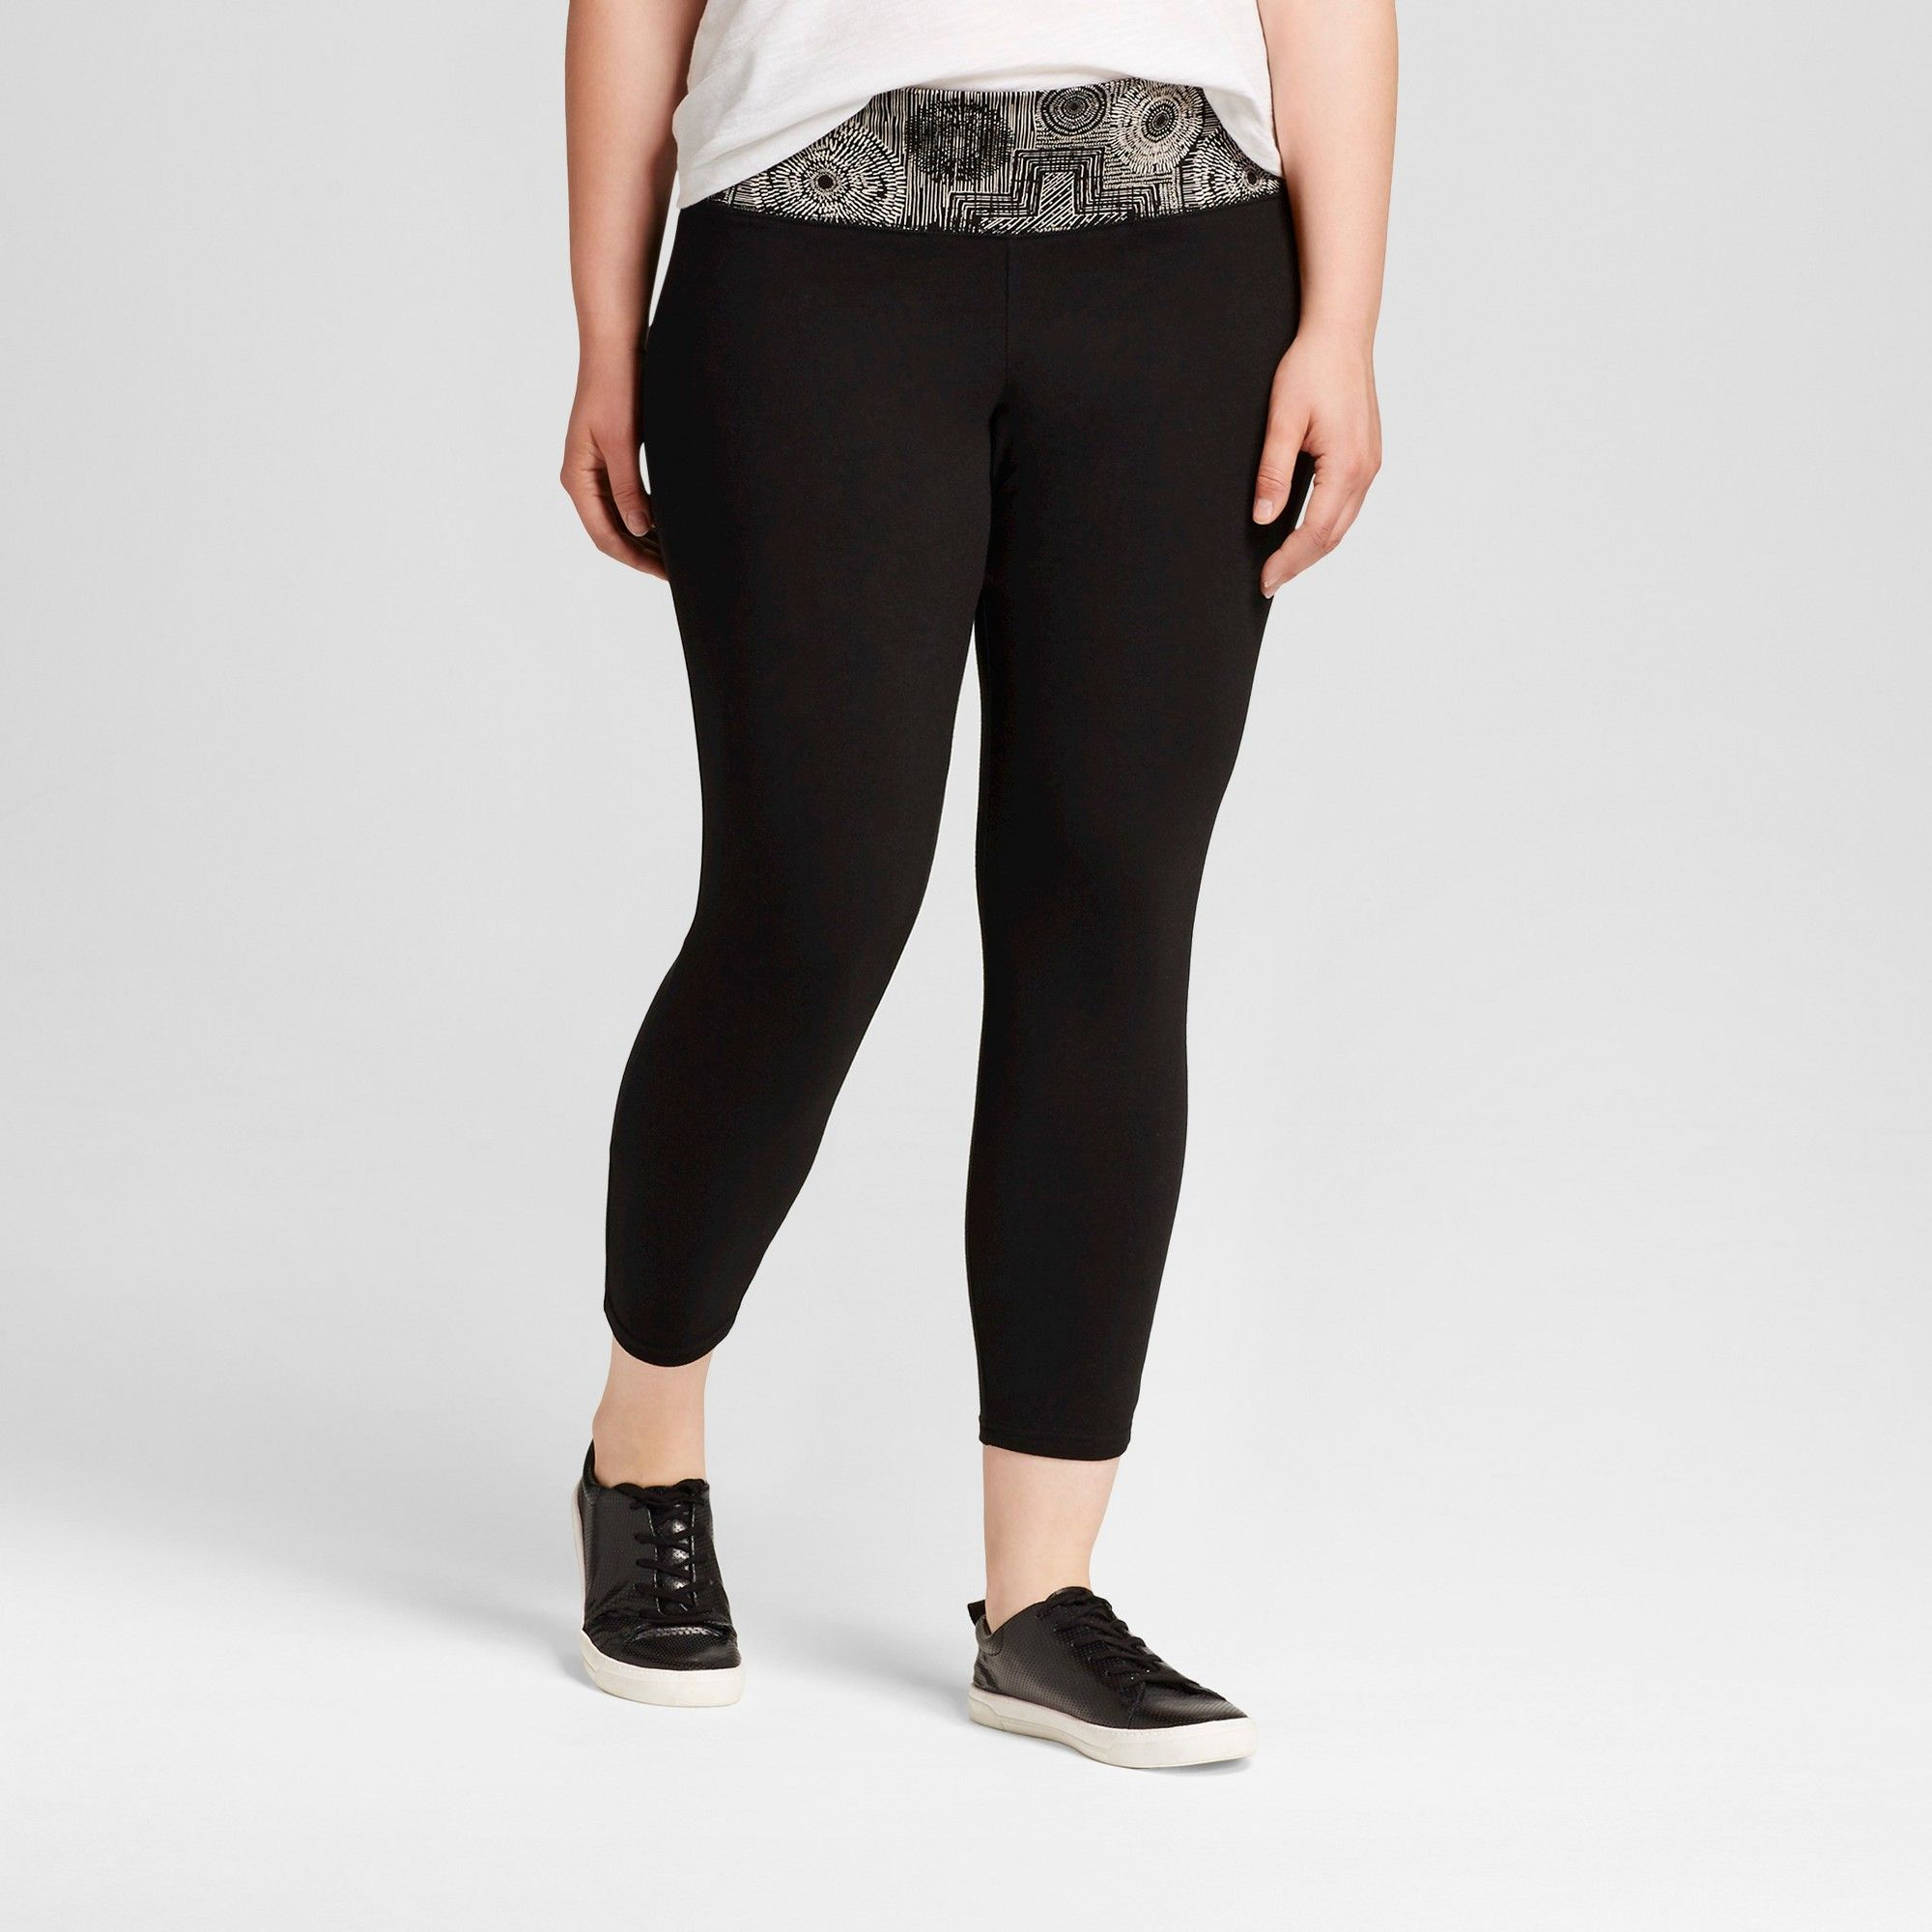 21acba063b Women's Plus Size Yoga Capri Leggings with Printed Waistband Black/White  Print 4X - Mossimo Supply Co.